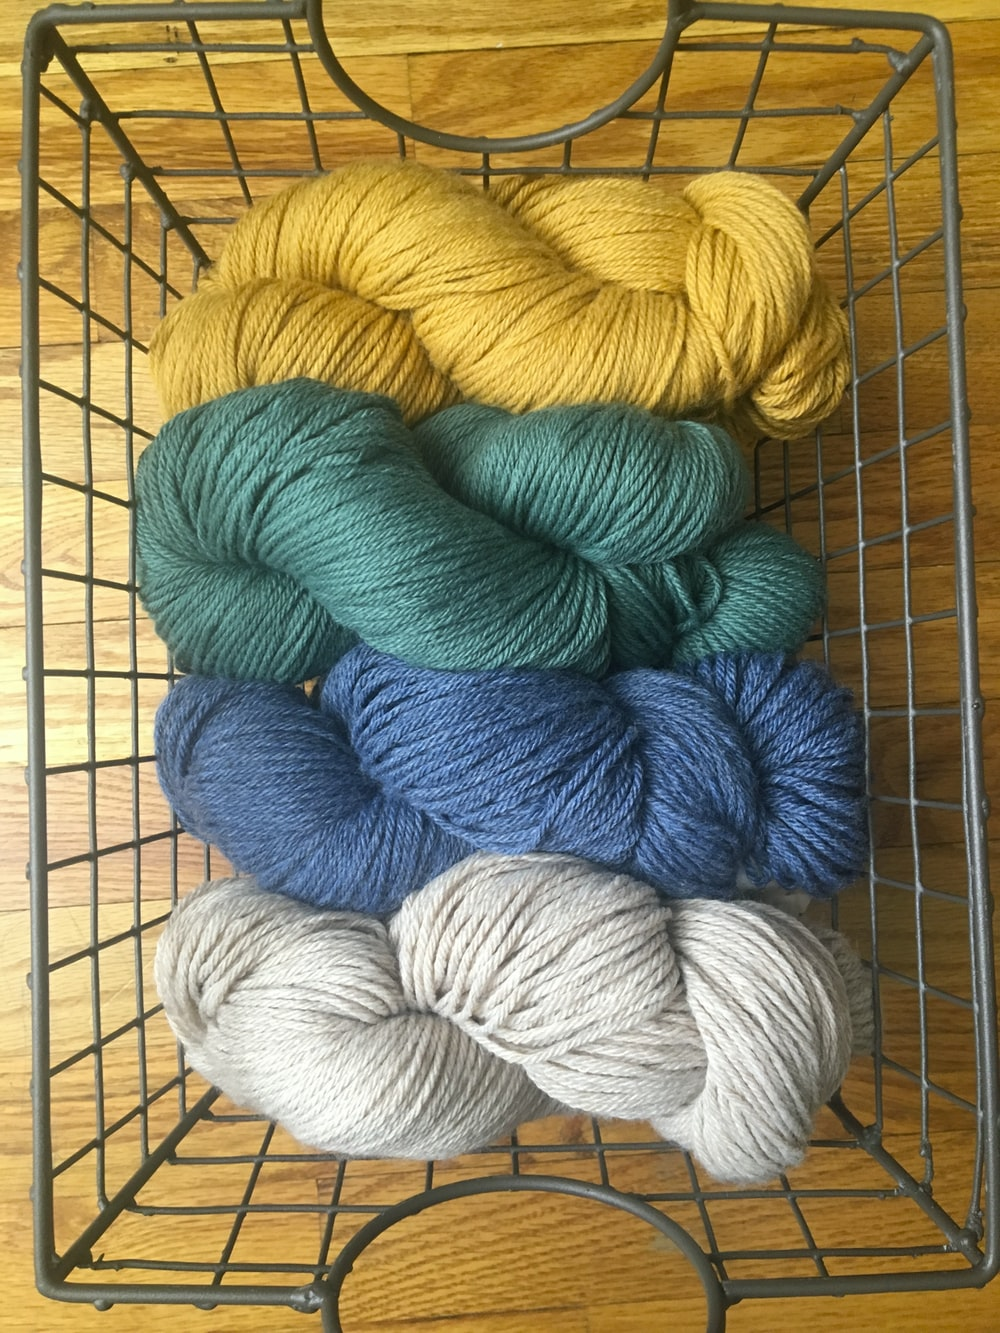 yellow, green, blue, and white yarn